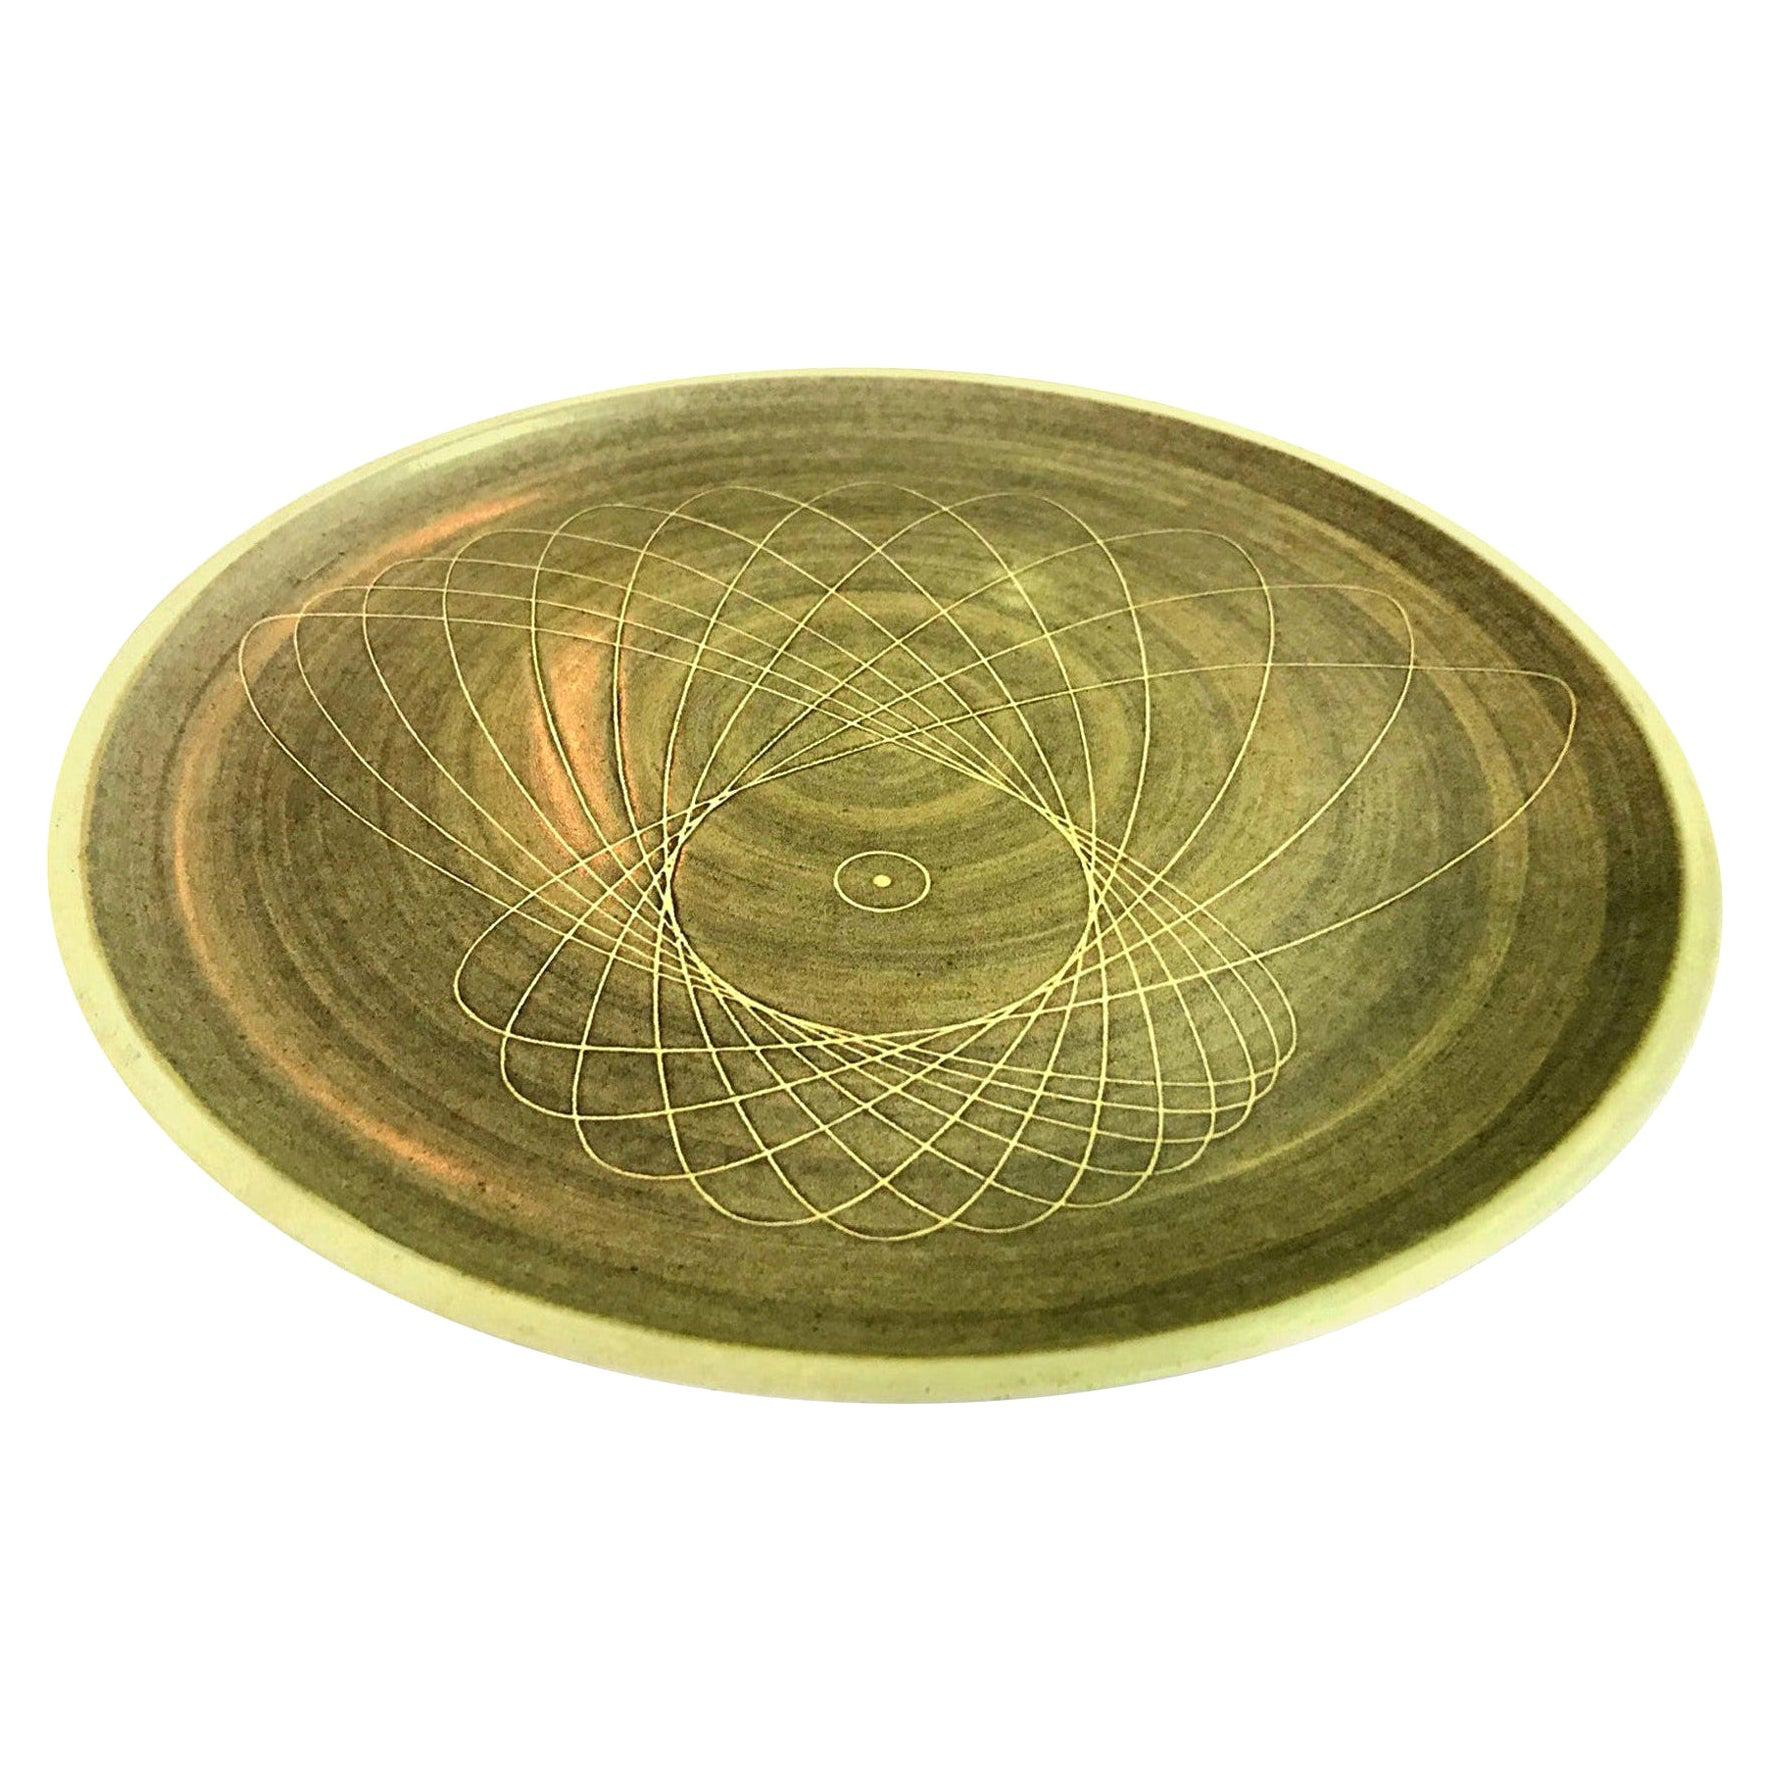 Harrison Mcintosh Signed Monumental Midcentury Large Ceramic Pottery Charger